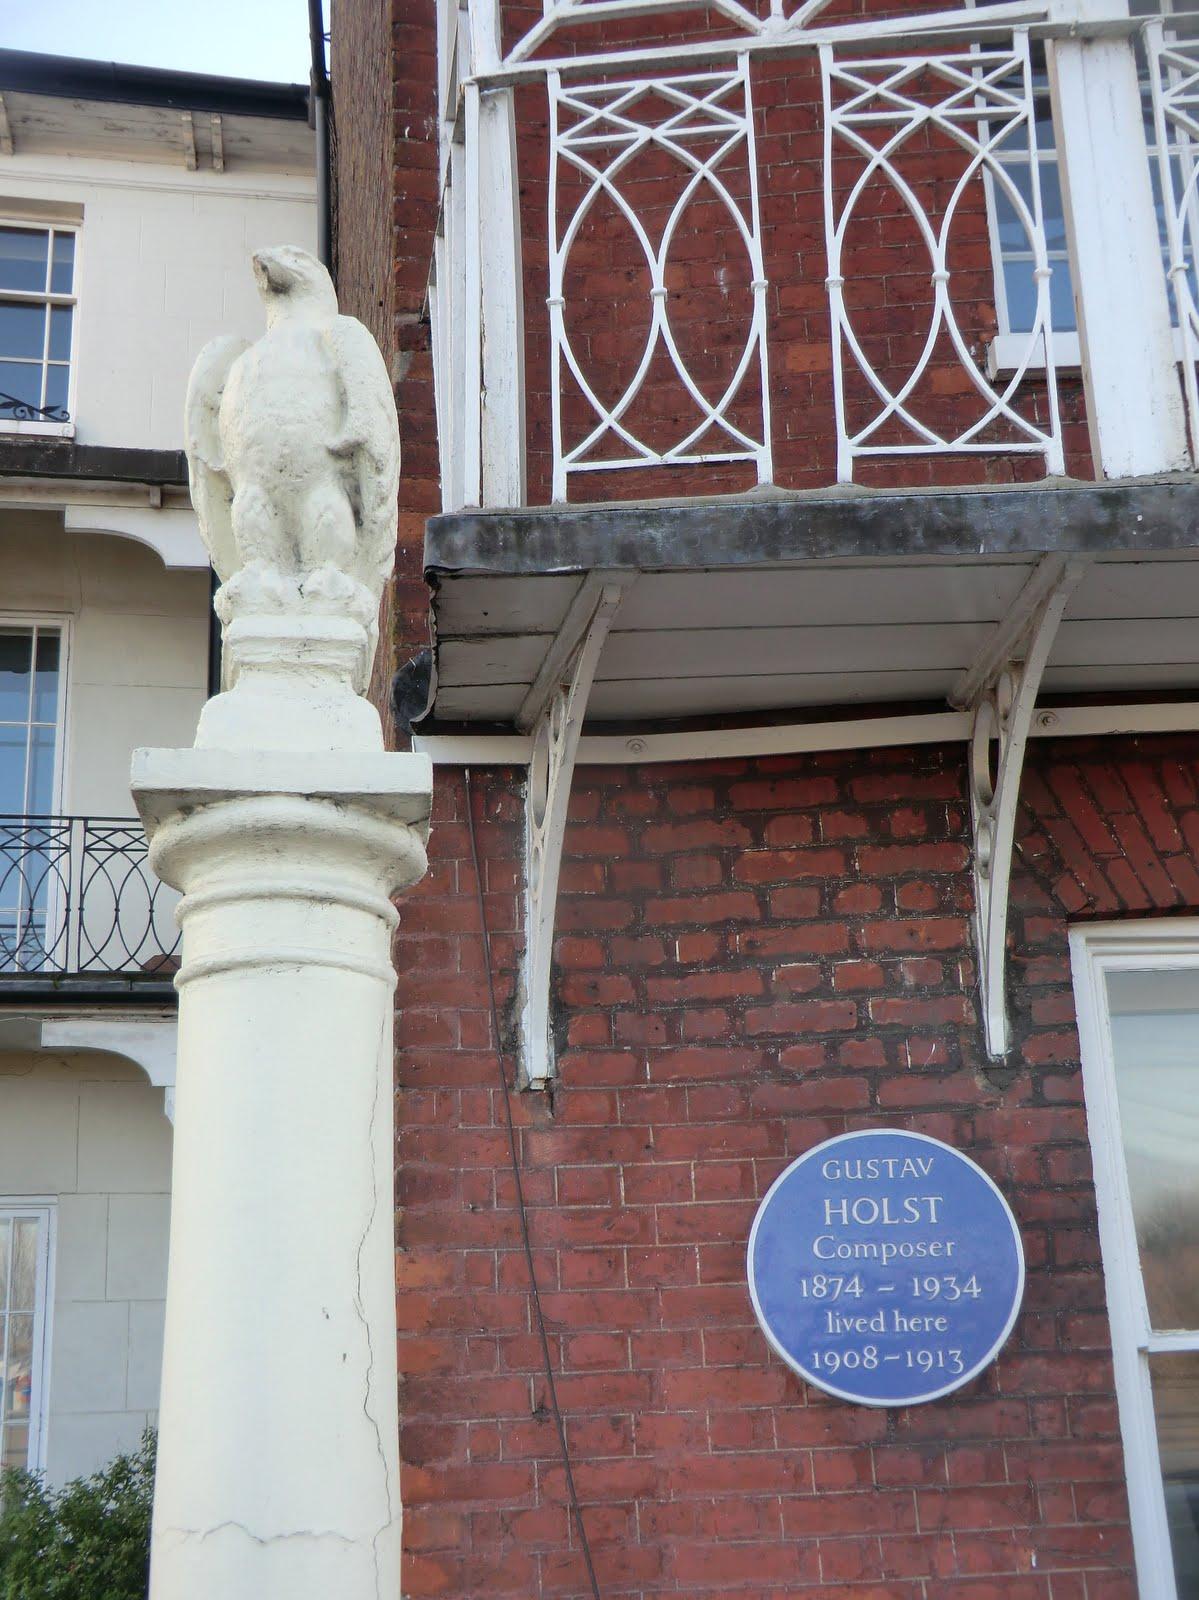 CIMG2491 Gustav Holst plaque, Barnes